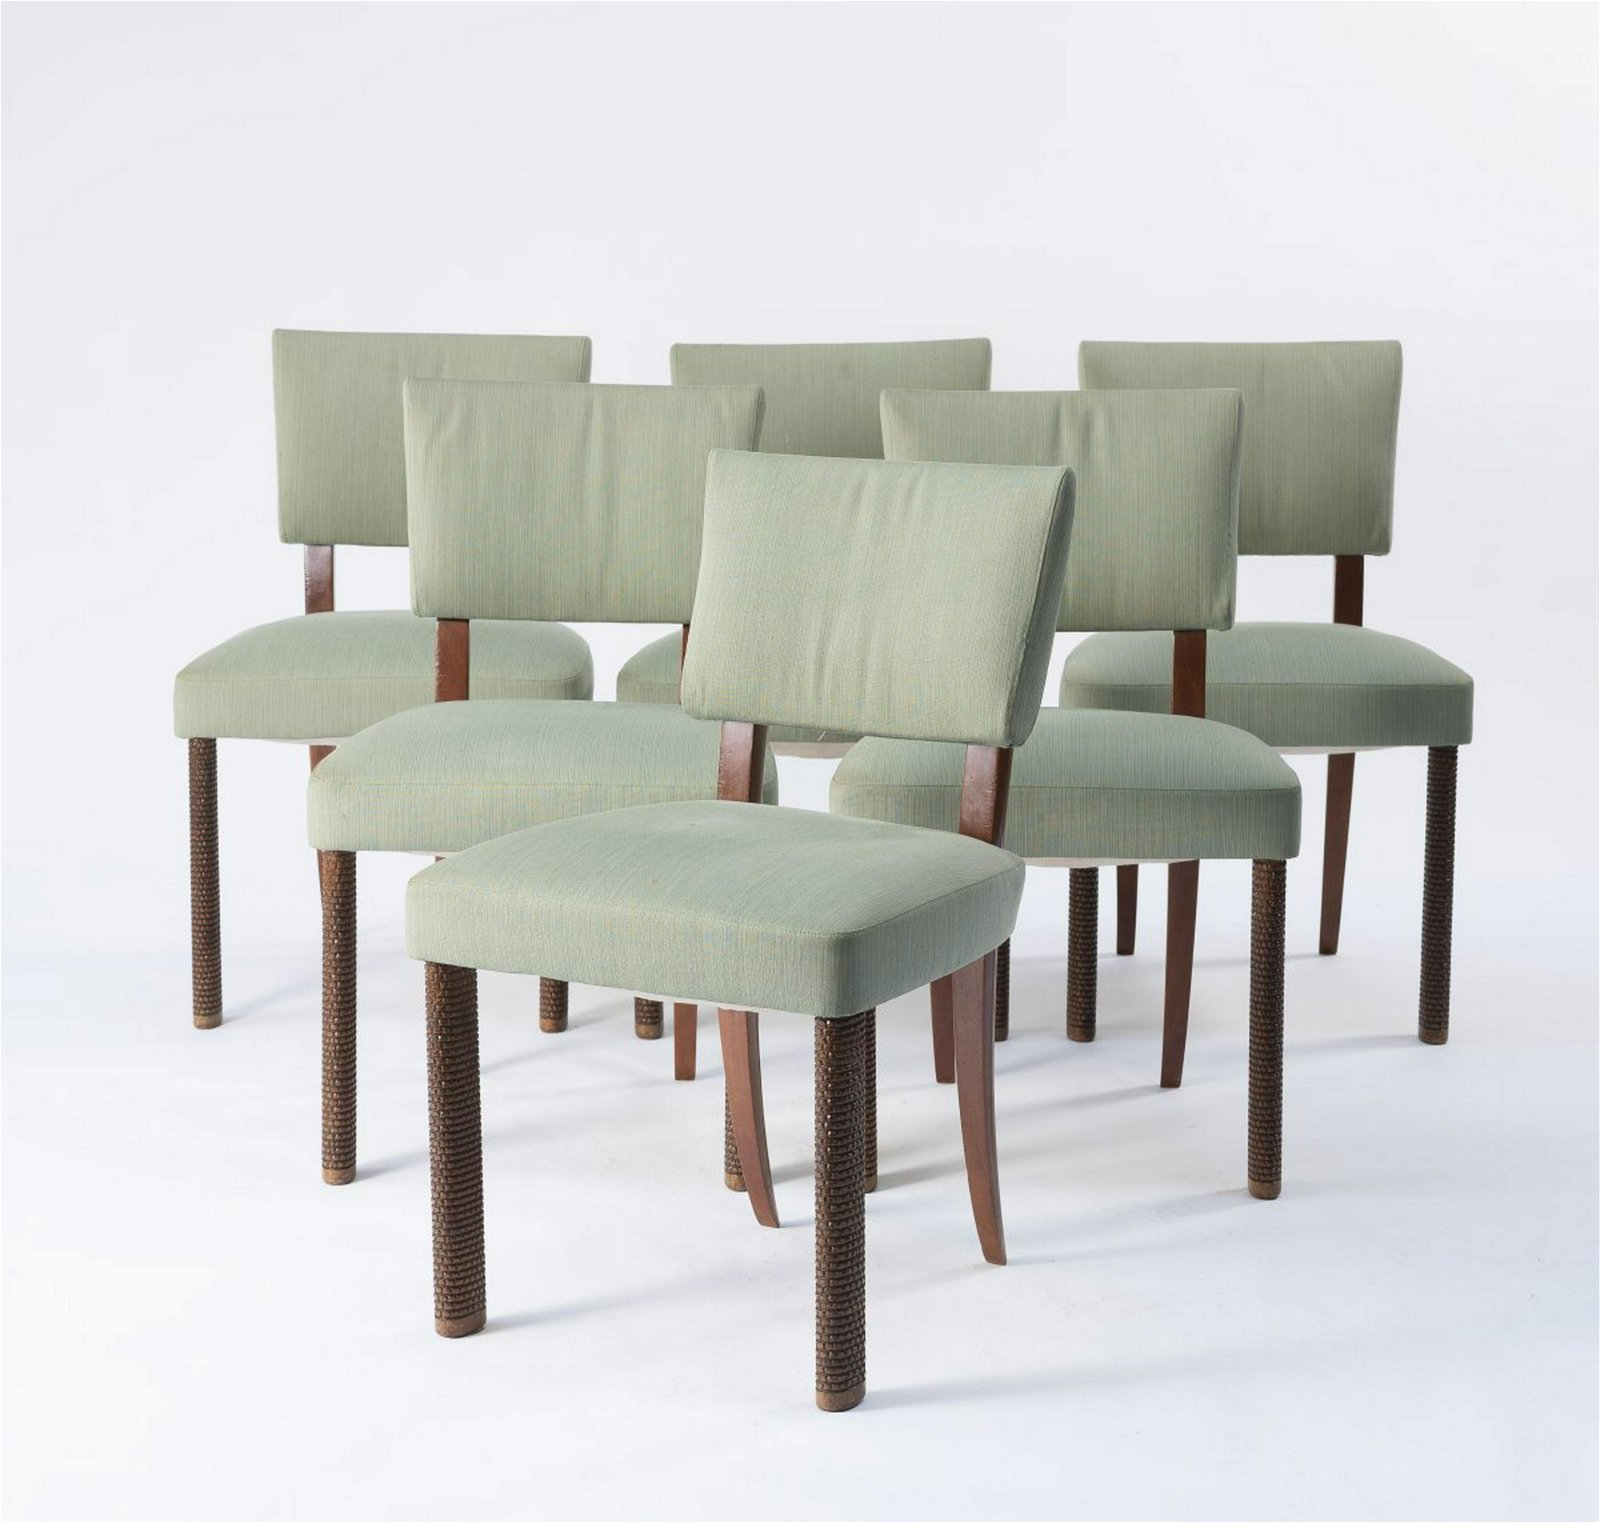 Osvaldo Borsani, Six chairs, c. 1937